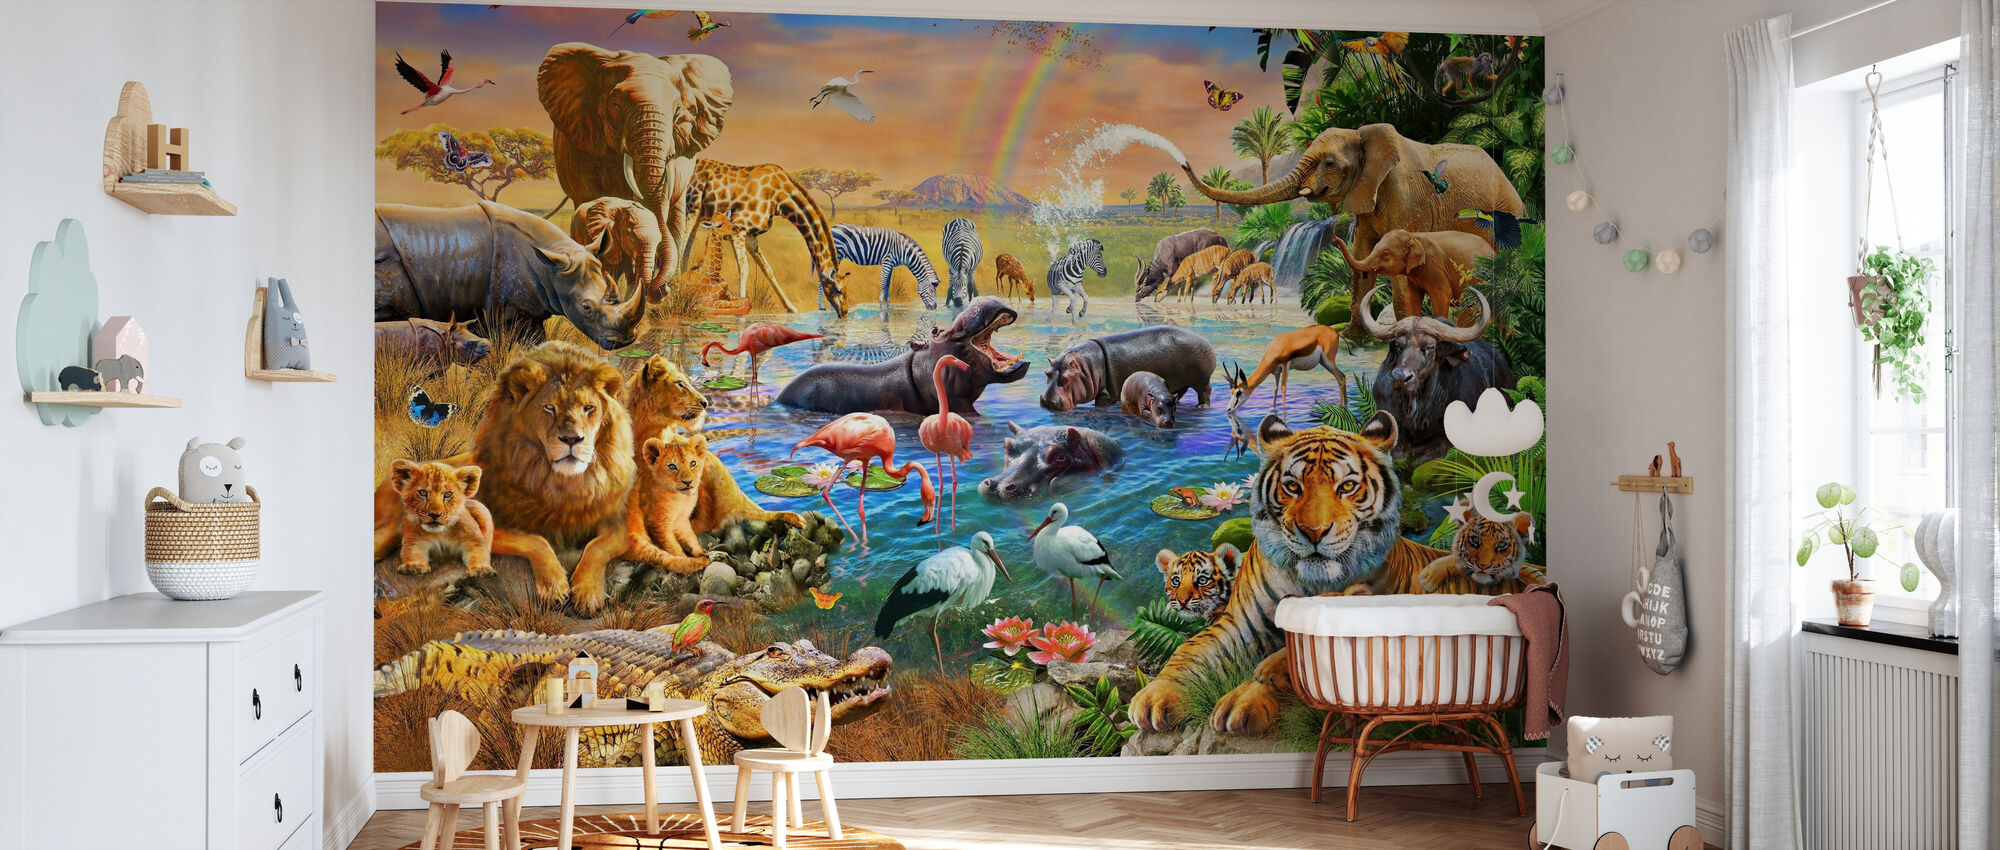 Savannah Jungle Vandhul - Tapet - Babyværelse